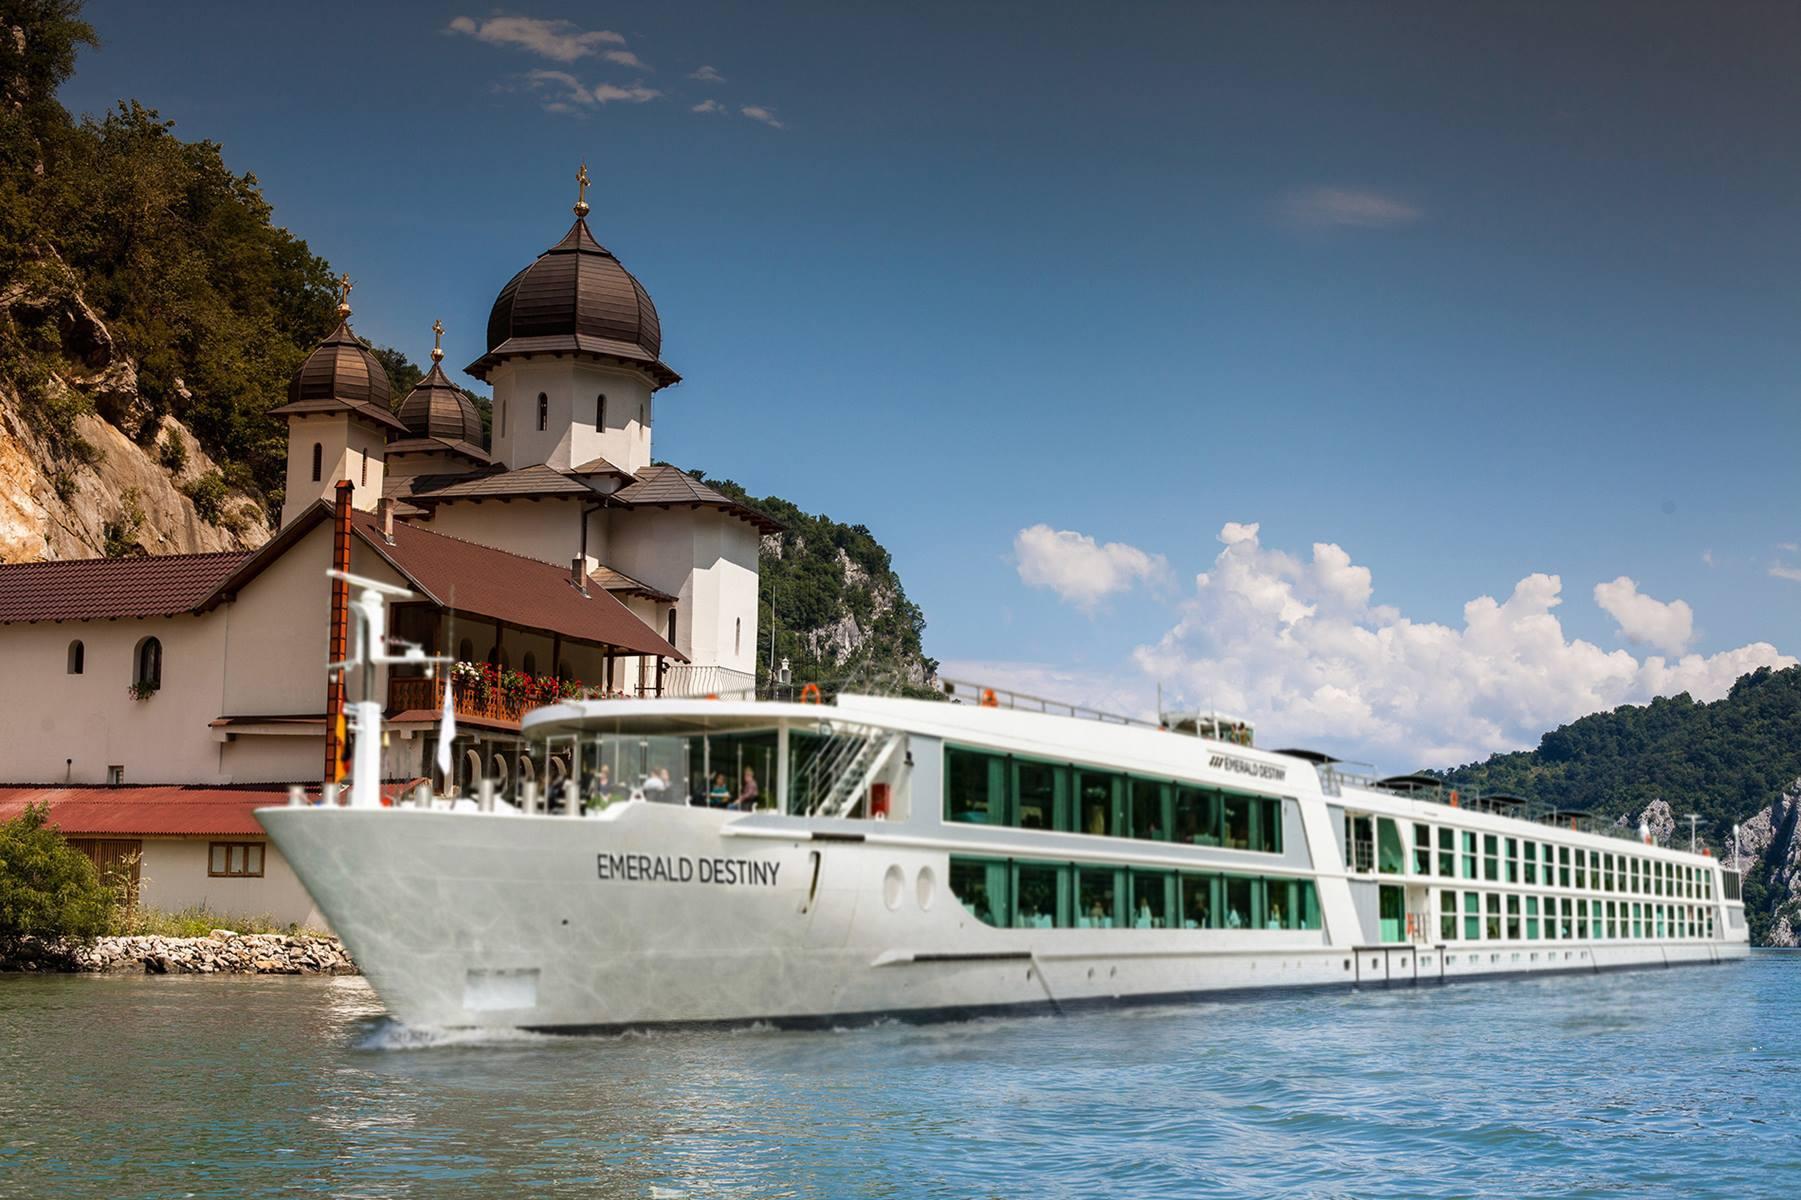 Emerald Destiny river cruise ship